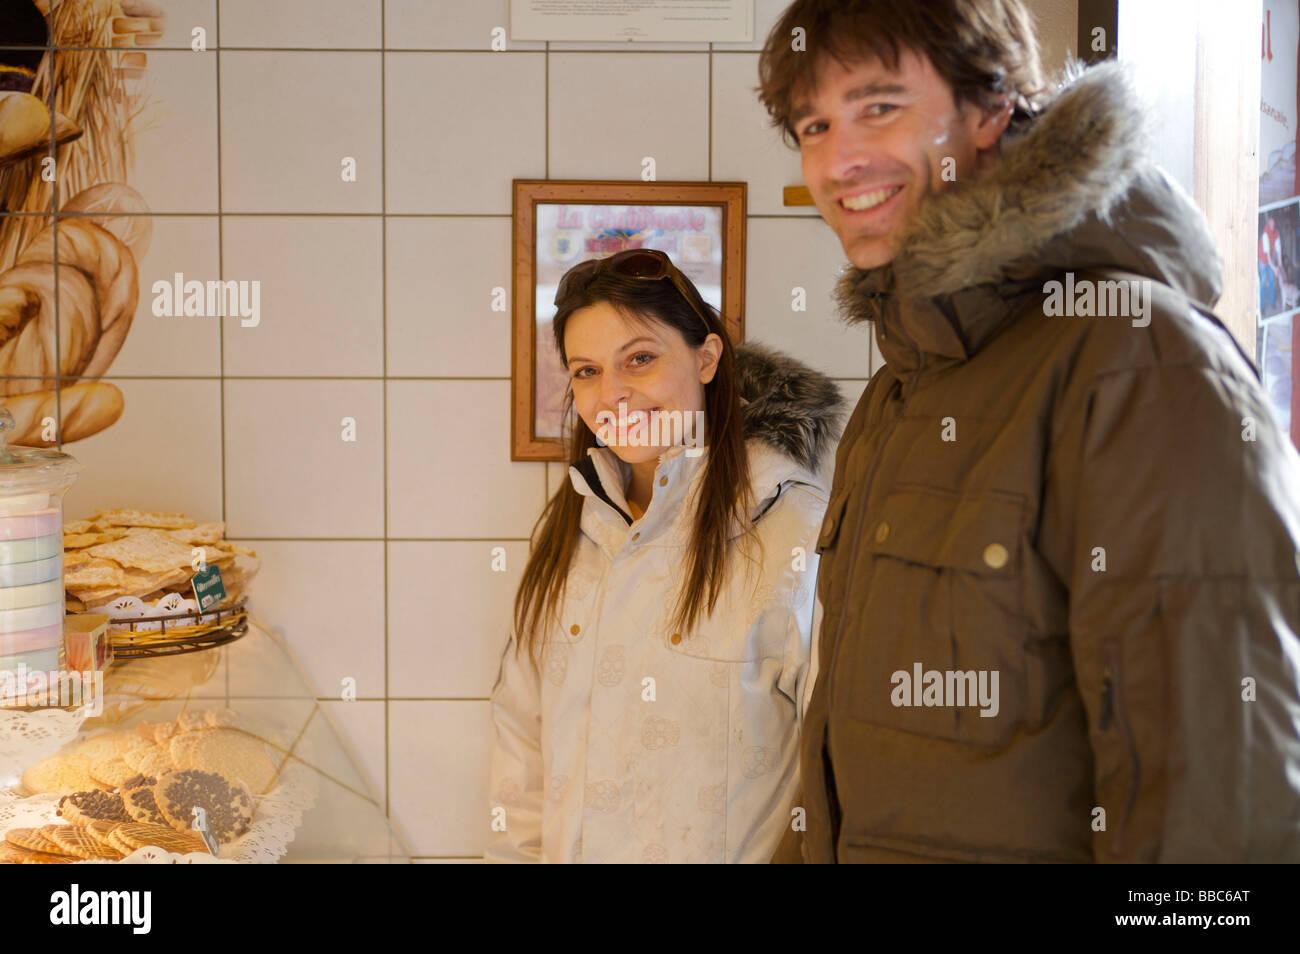 Couple in casual ski wear. - Stock Image